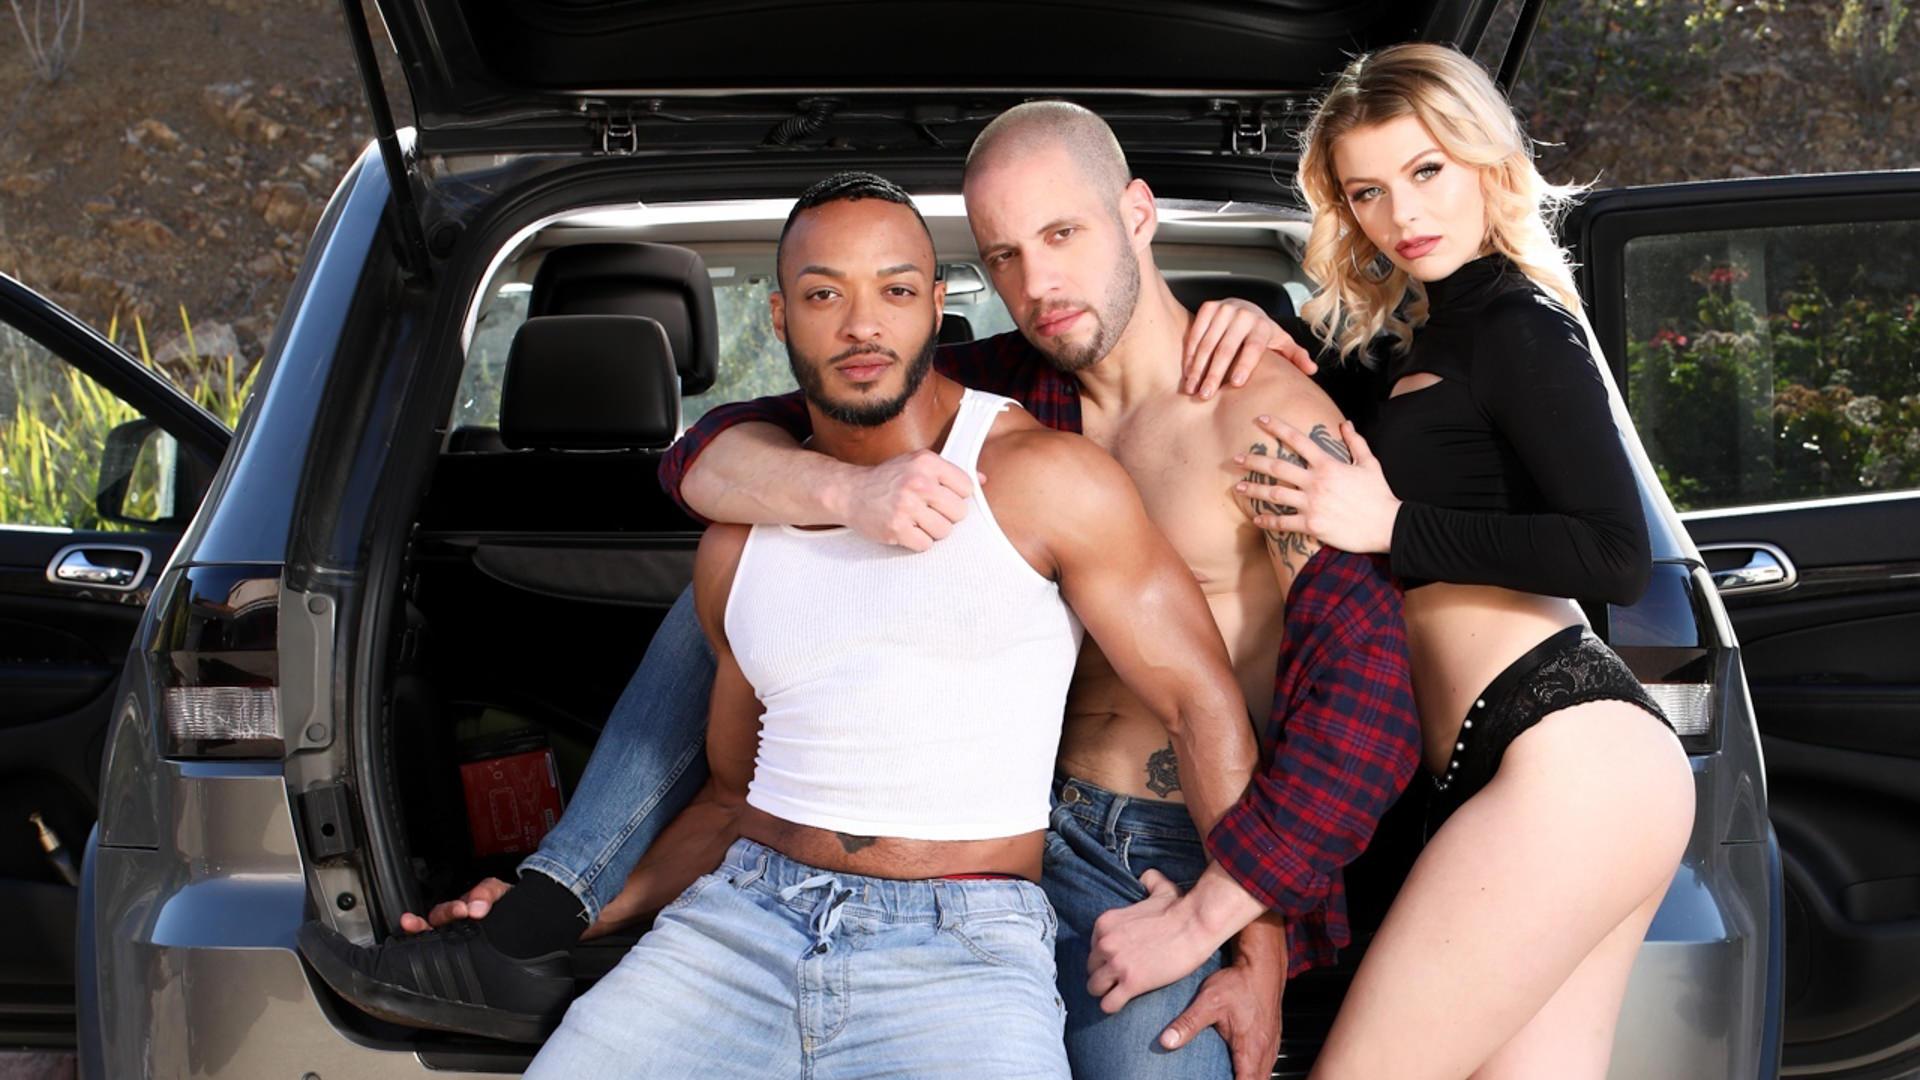 Drive Bi - Wolf Hudson & Dillon Diaz & Sahara Skye 1